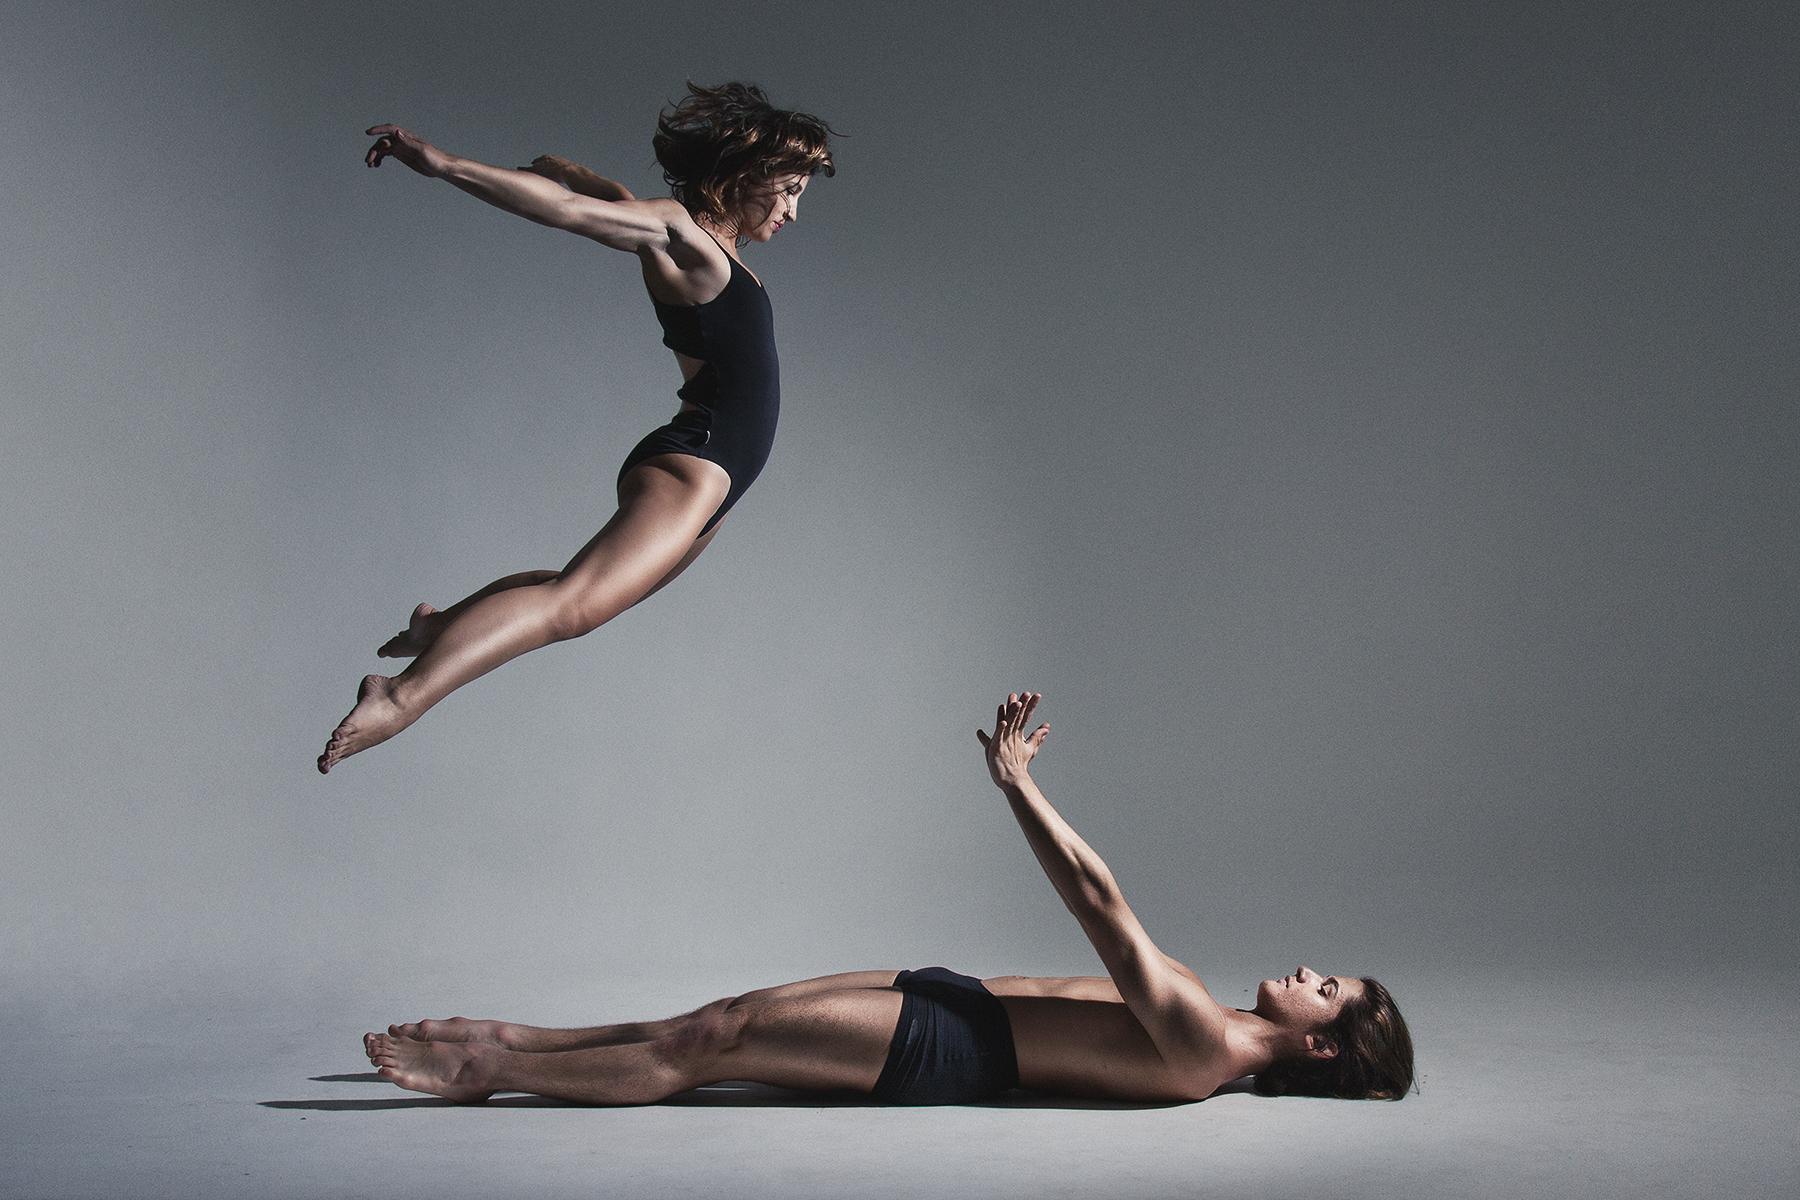 Fondos de pantalla : Deportes, descalzo, Saltando, fotografía ...